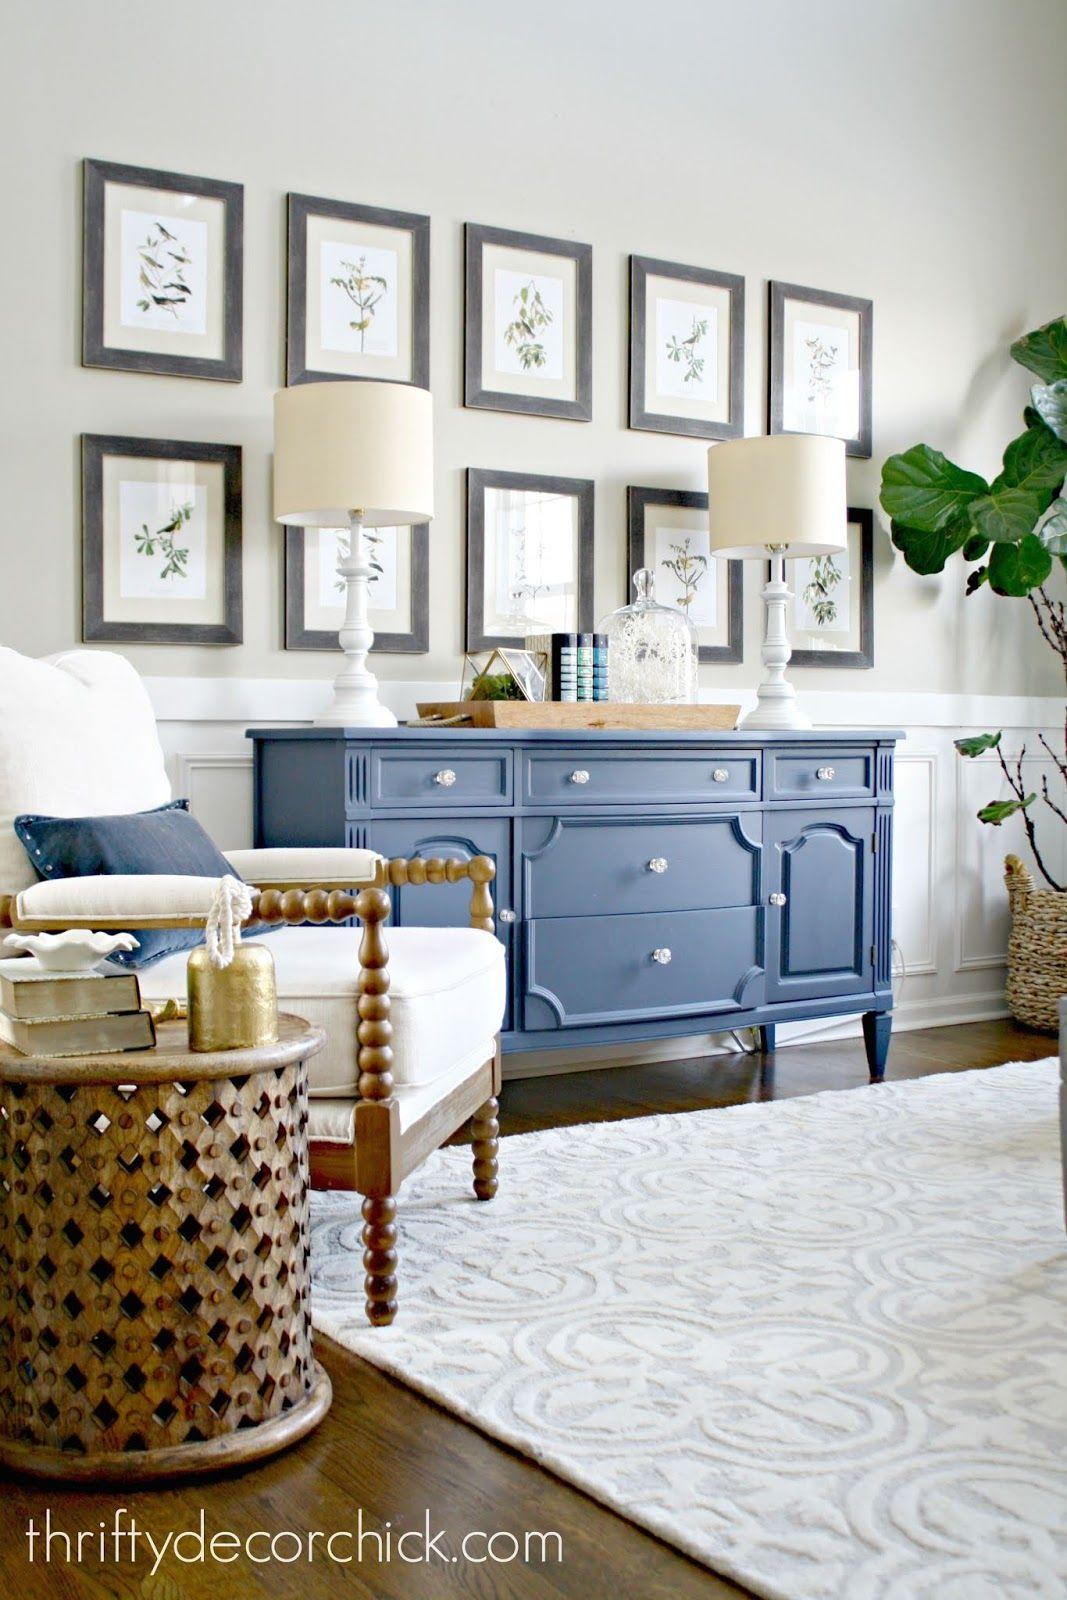 Affordable Diy Ideas For Filling Big Blank Walls Big Wall Decor Foyer Decorating Large Wall Decor